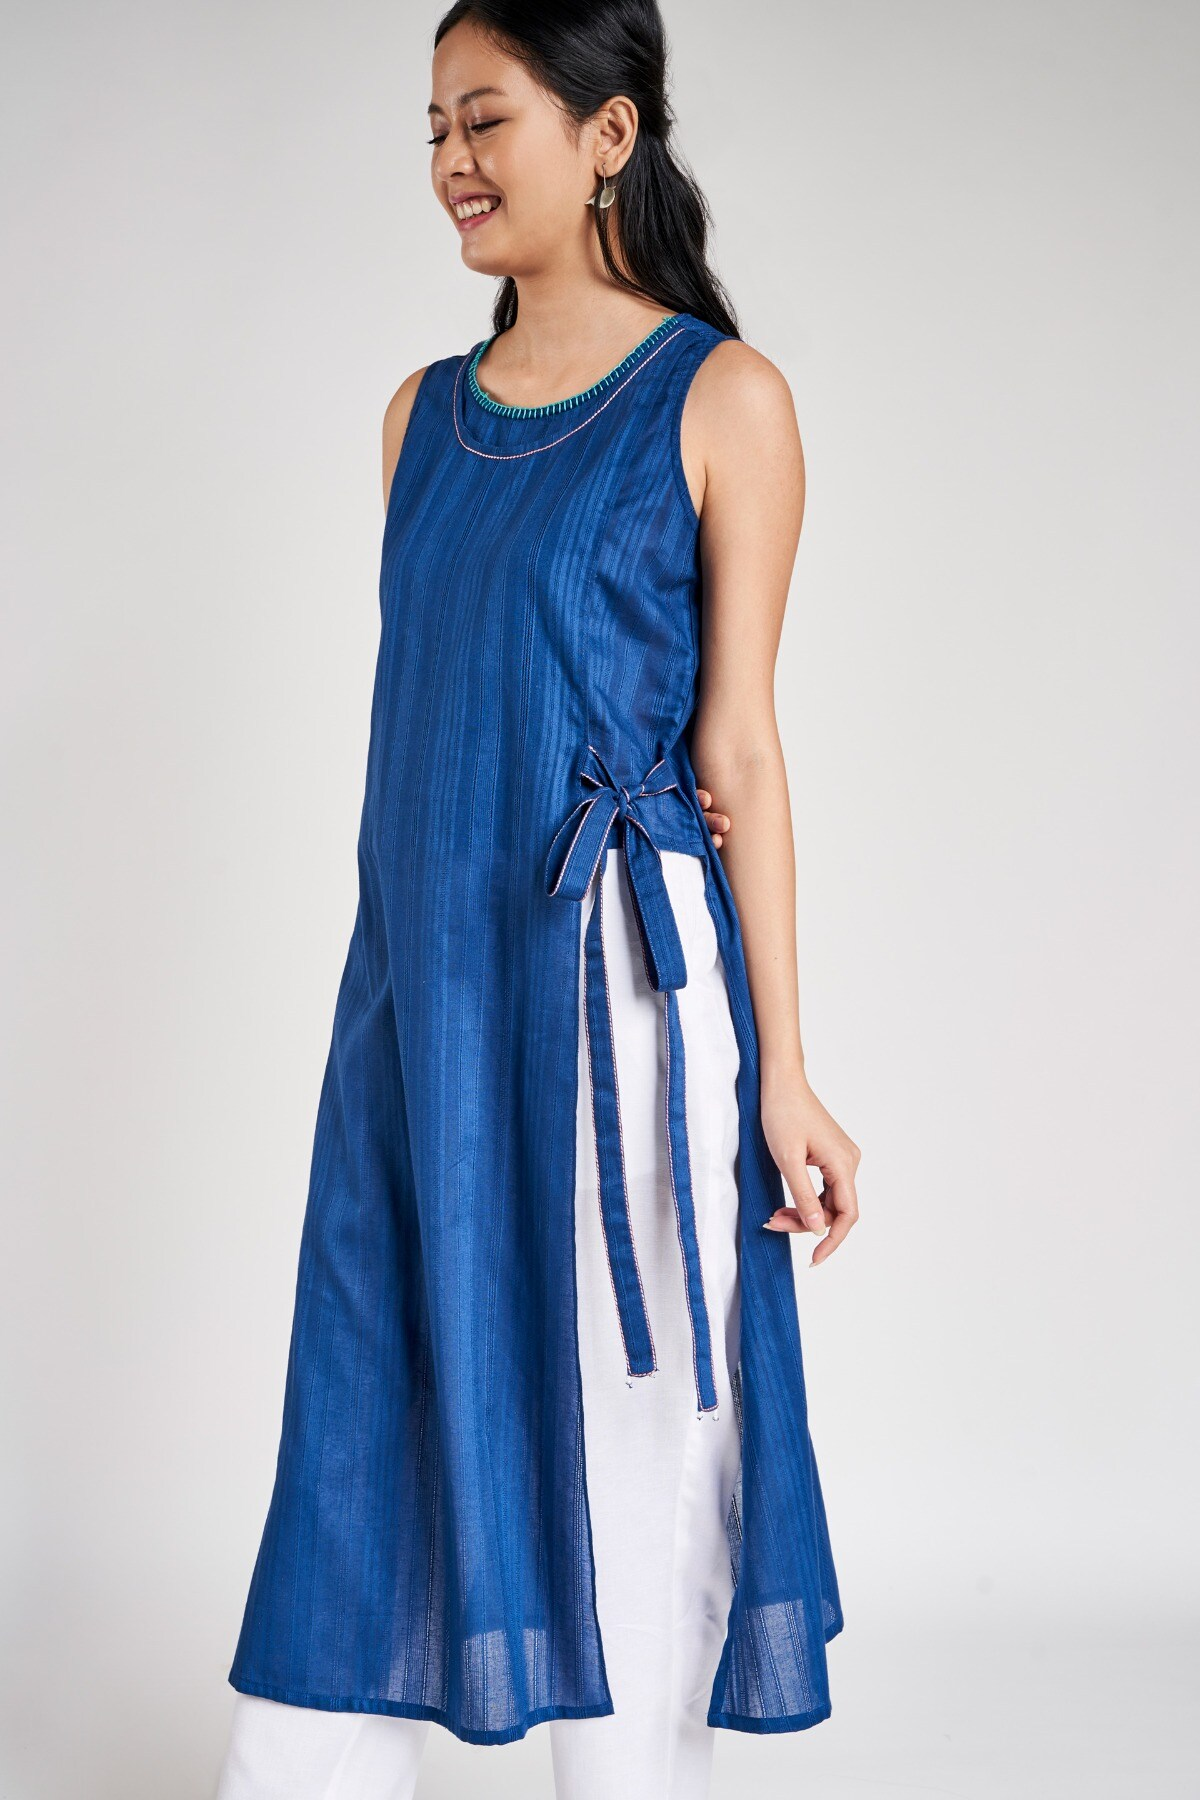 Global Desi | Ink Blue Self Design A-Line Kurta